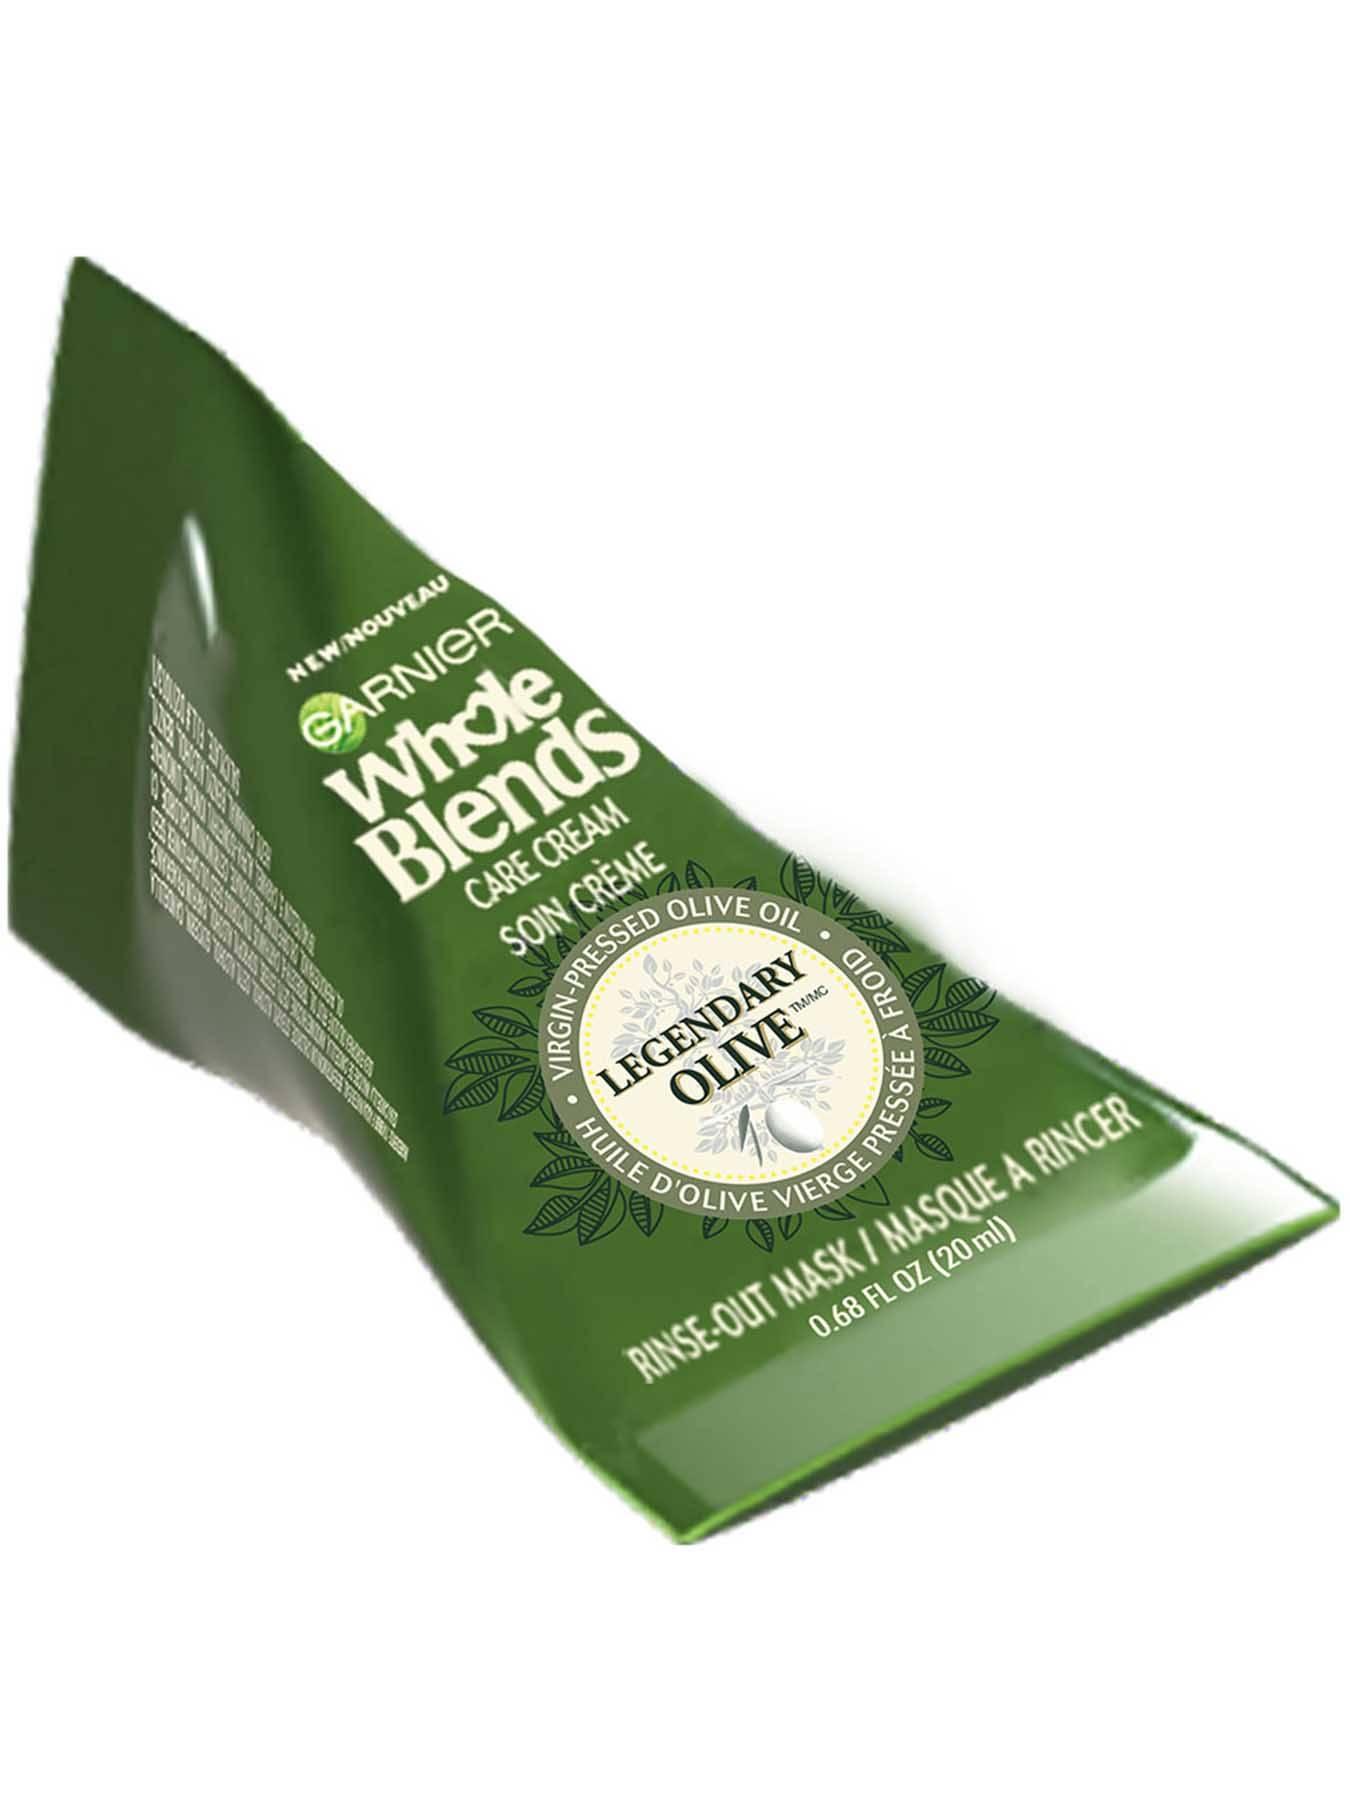 Whole Blends Care Cream Legendary Olive Hair Mask Garnier